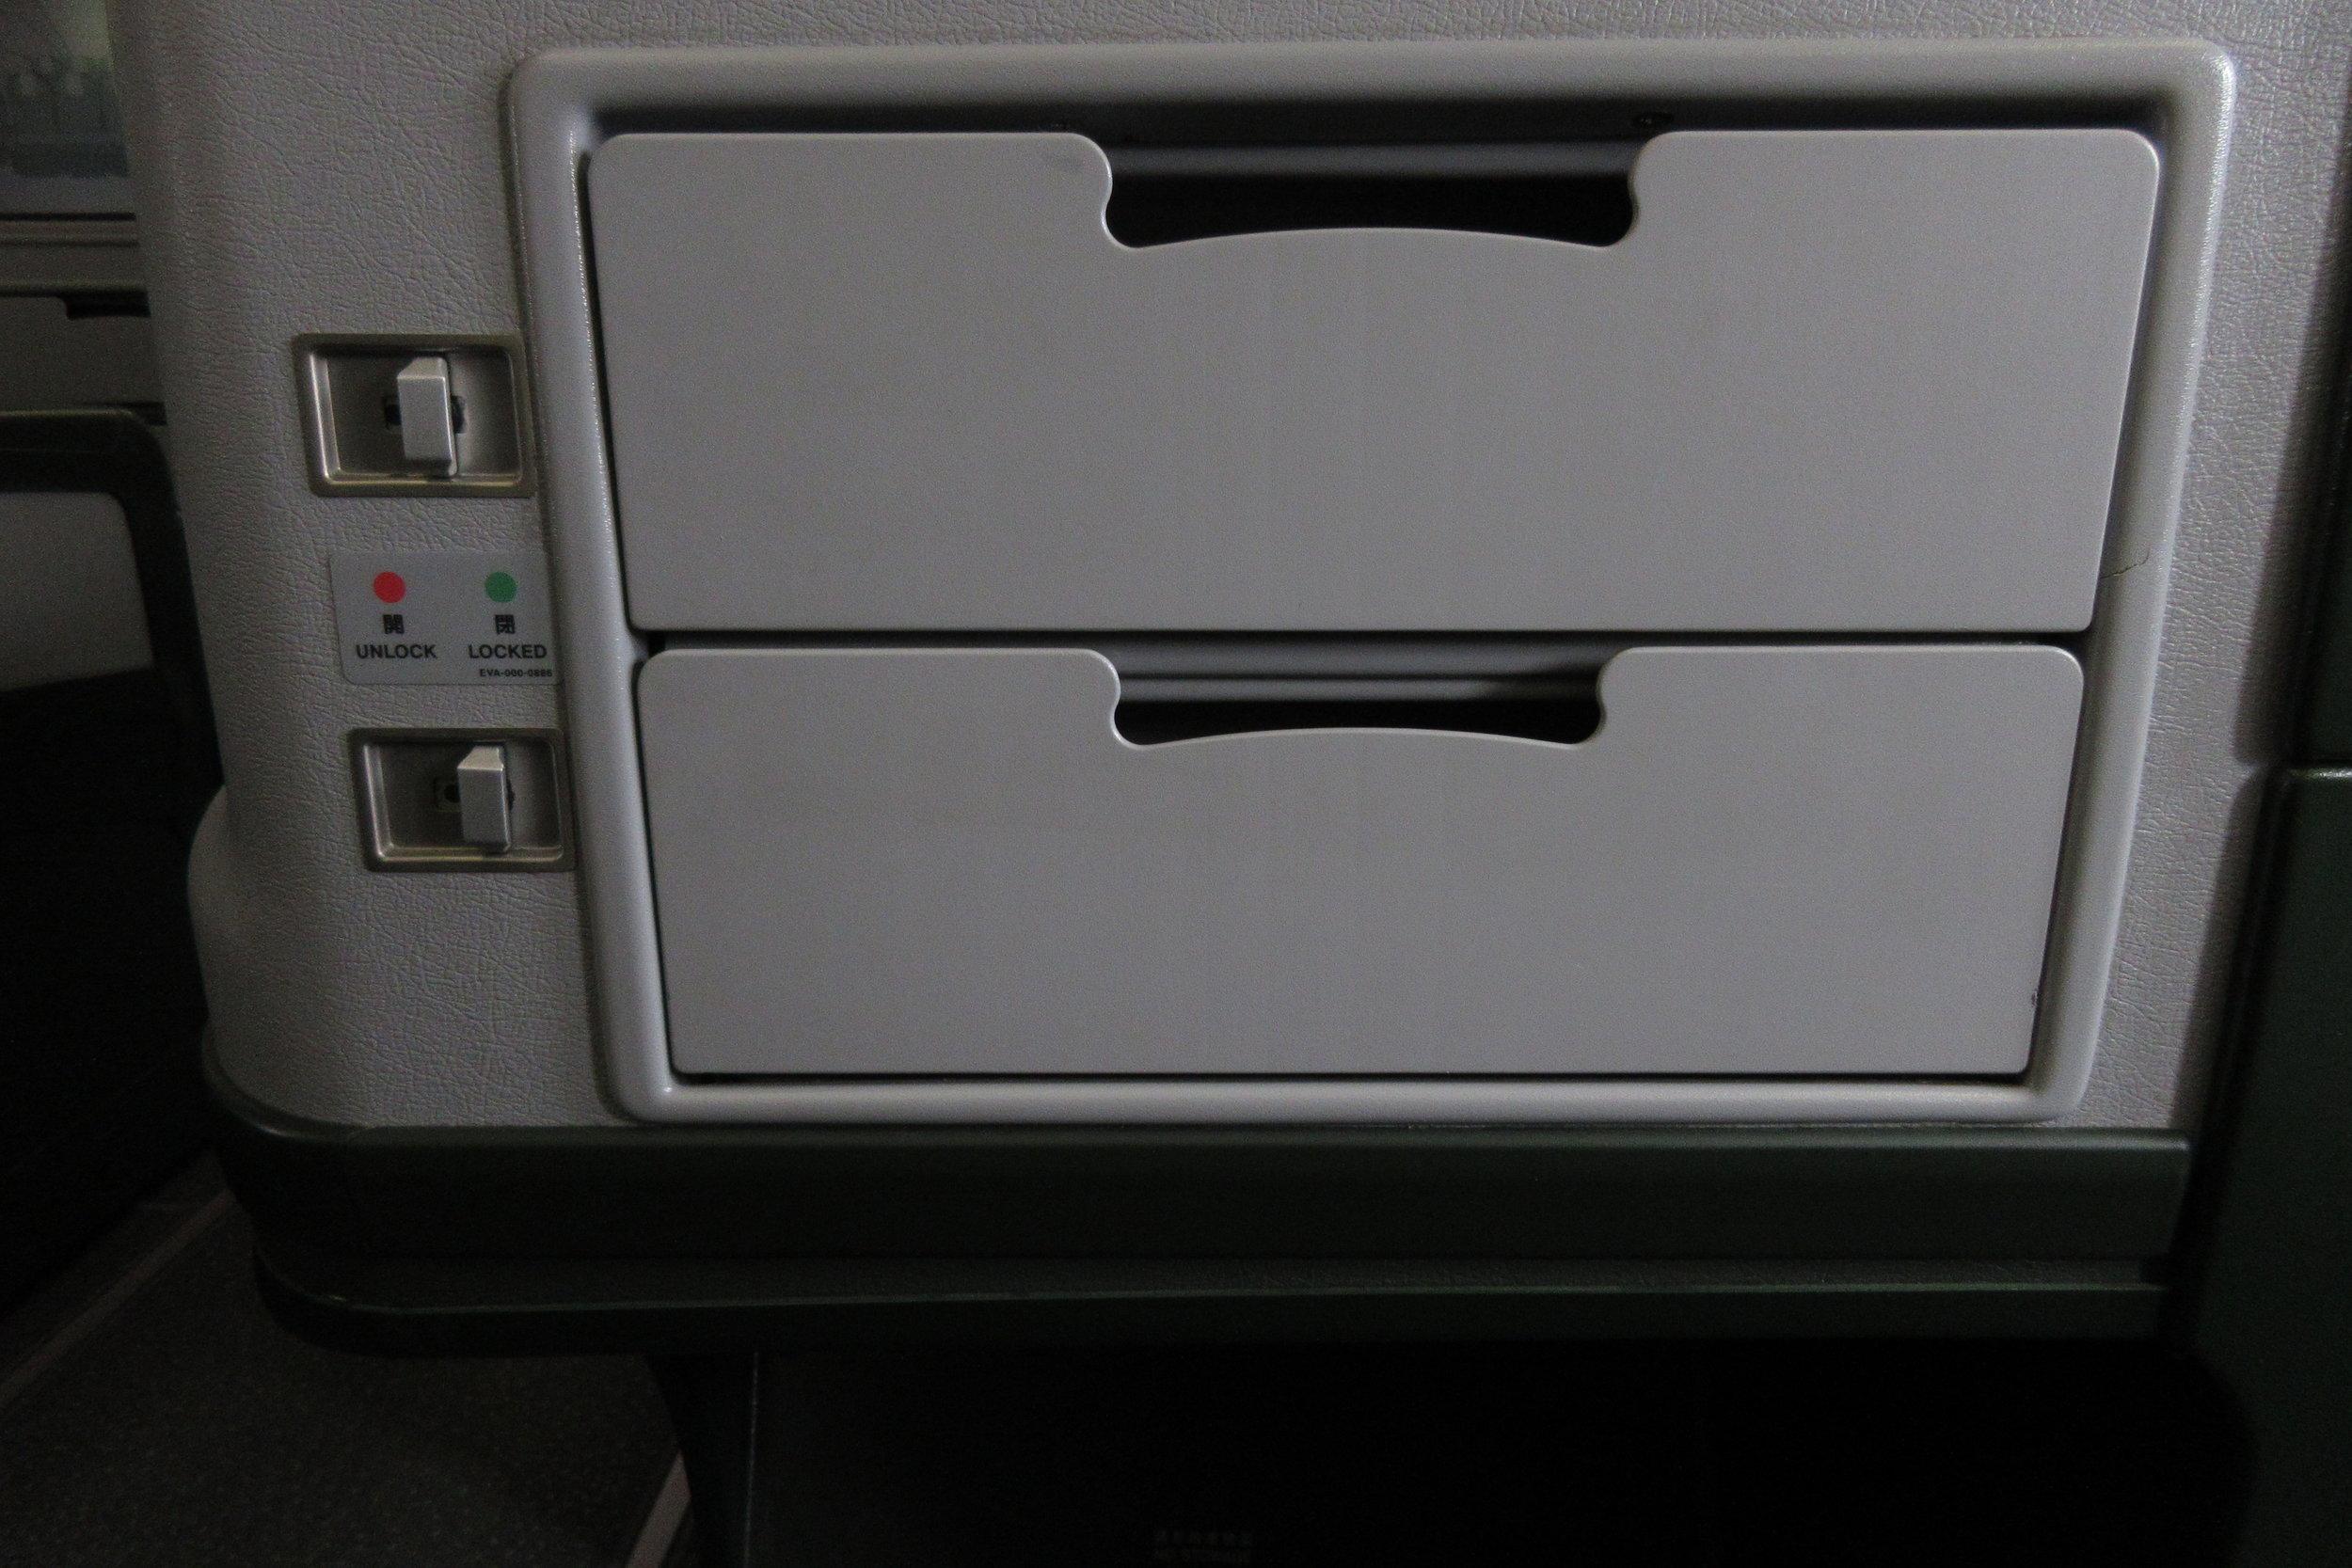 EVA Air regional business class – Storage compartments